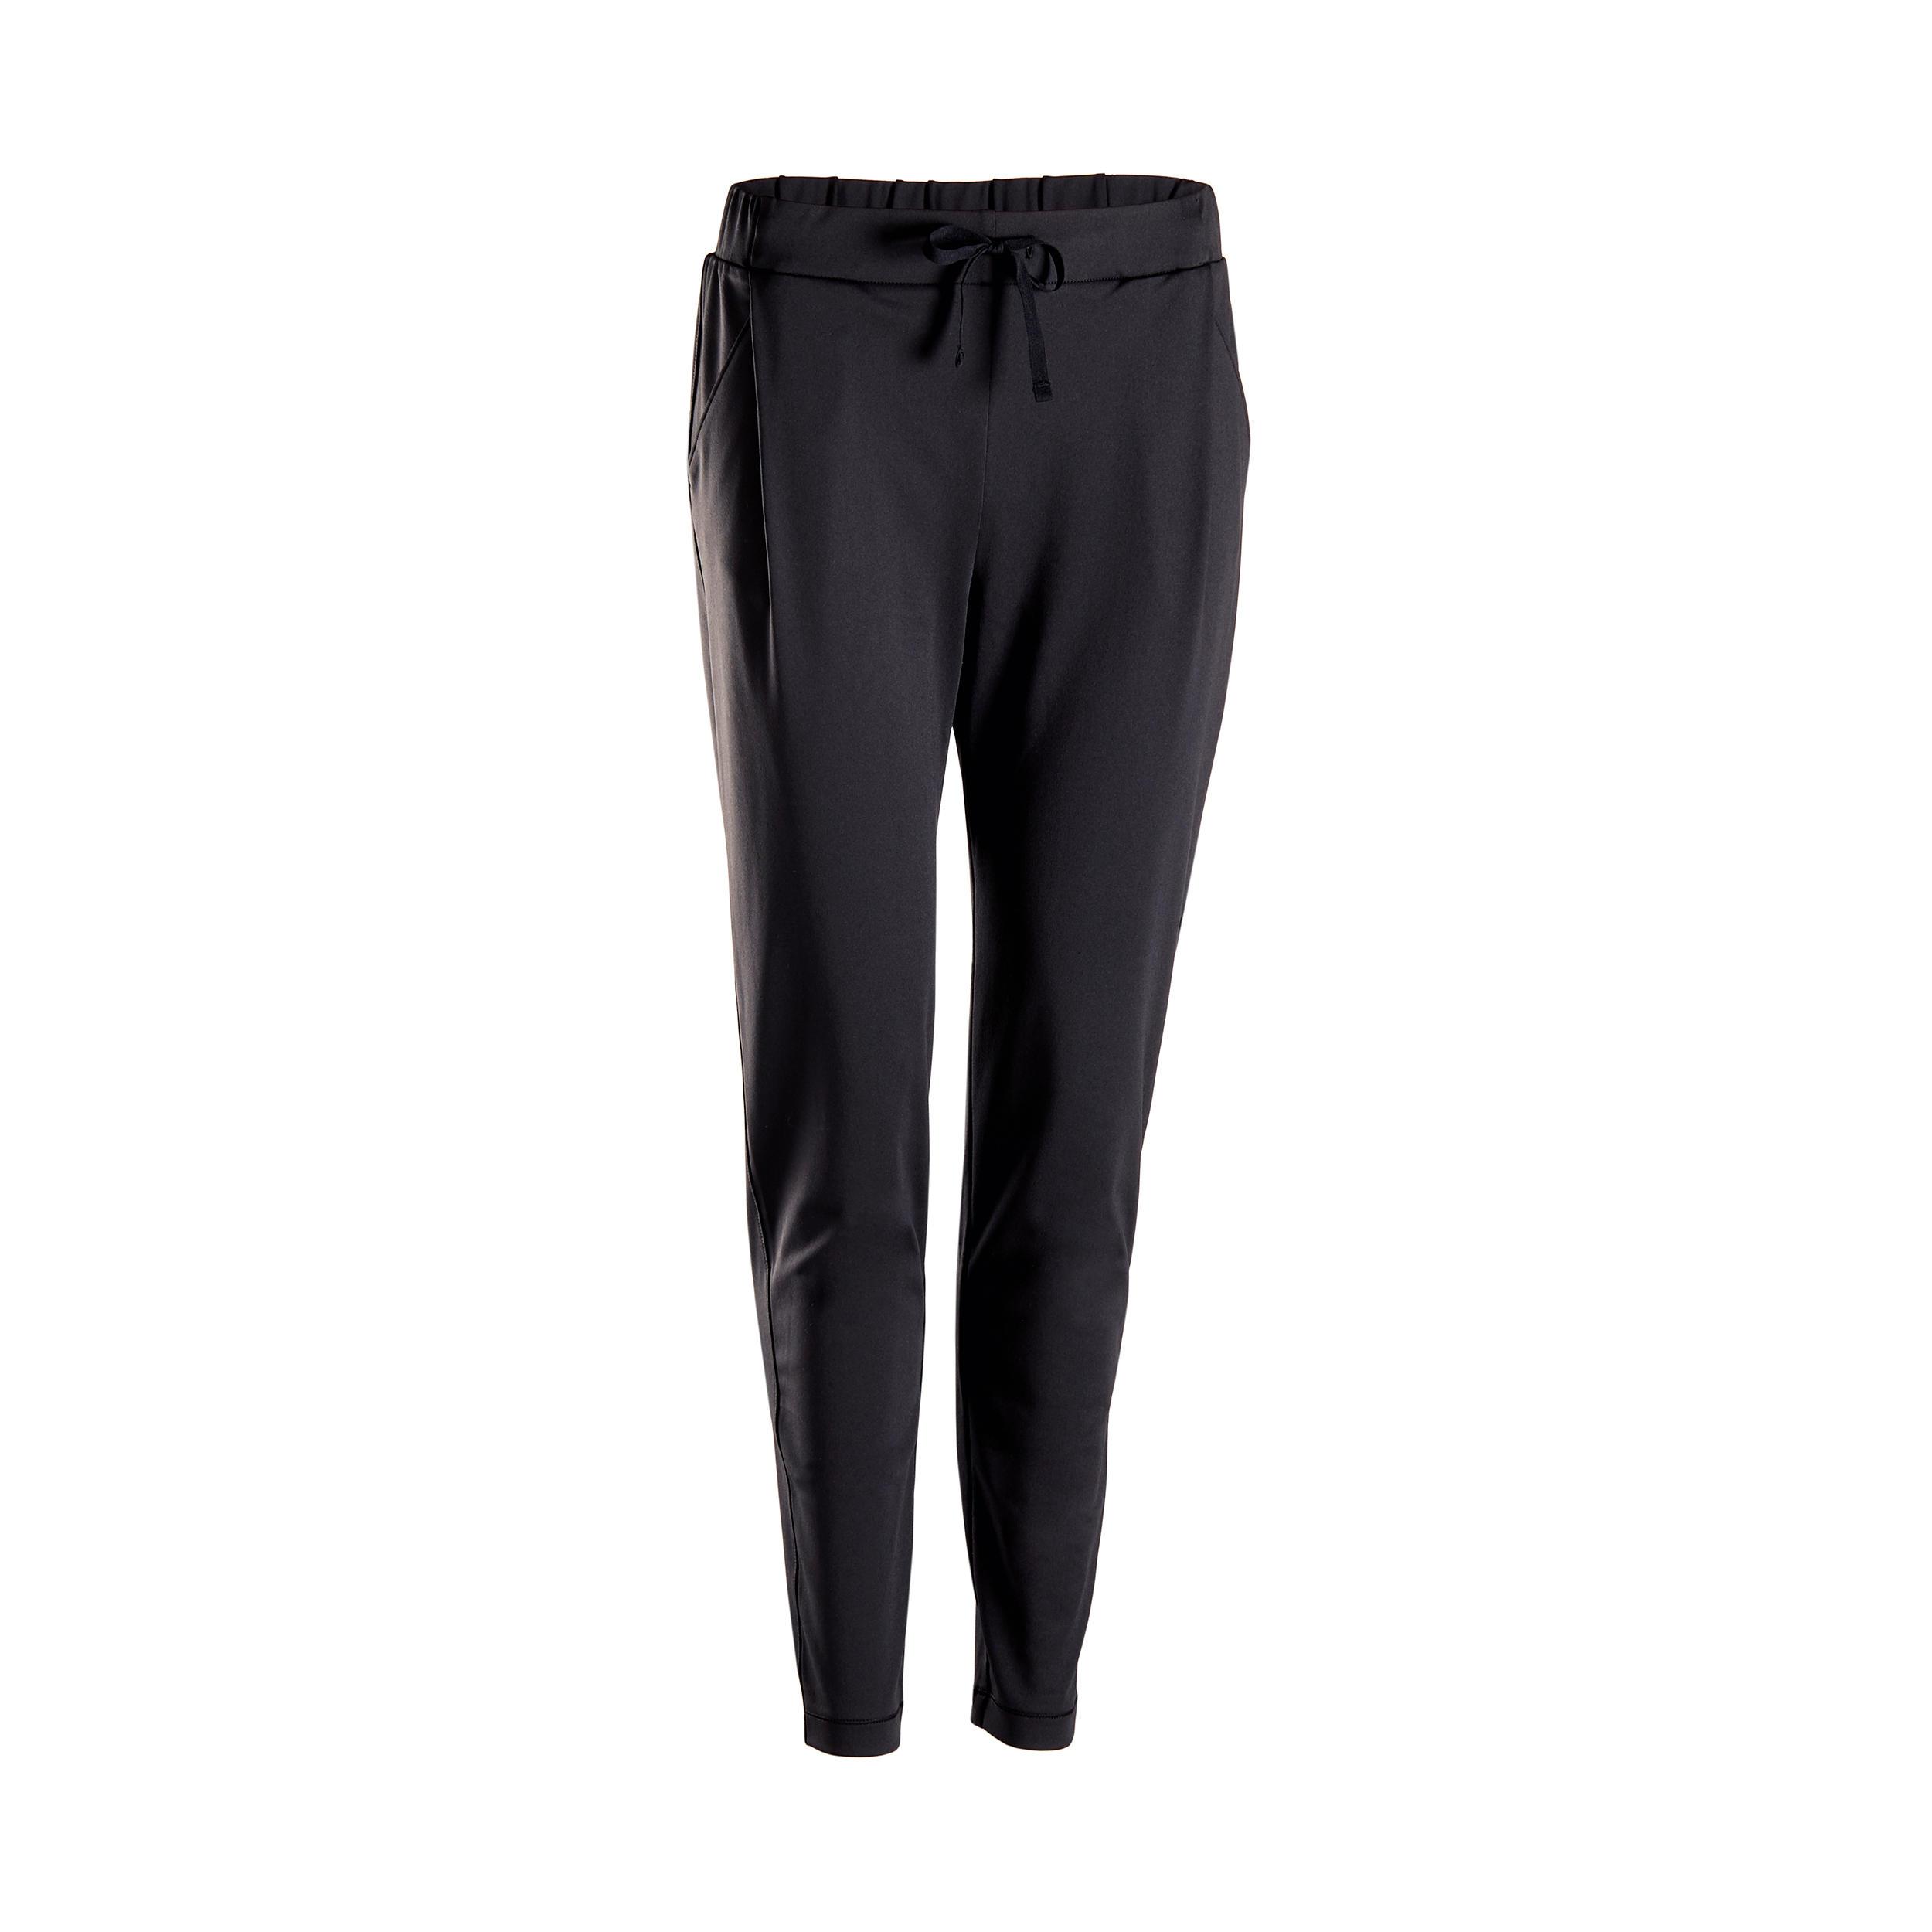 Femme Coton Leggings Fitness Running Gym Exercice Yoga Pantalon Active Décontracté